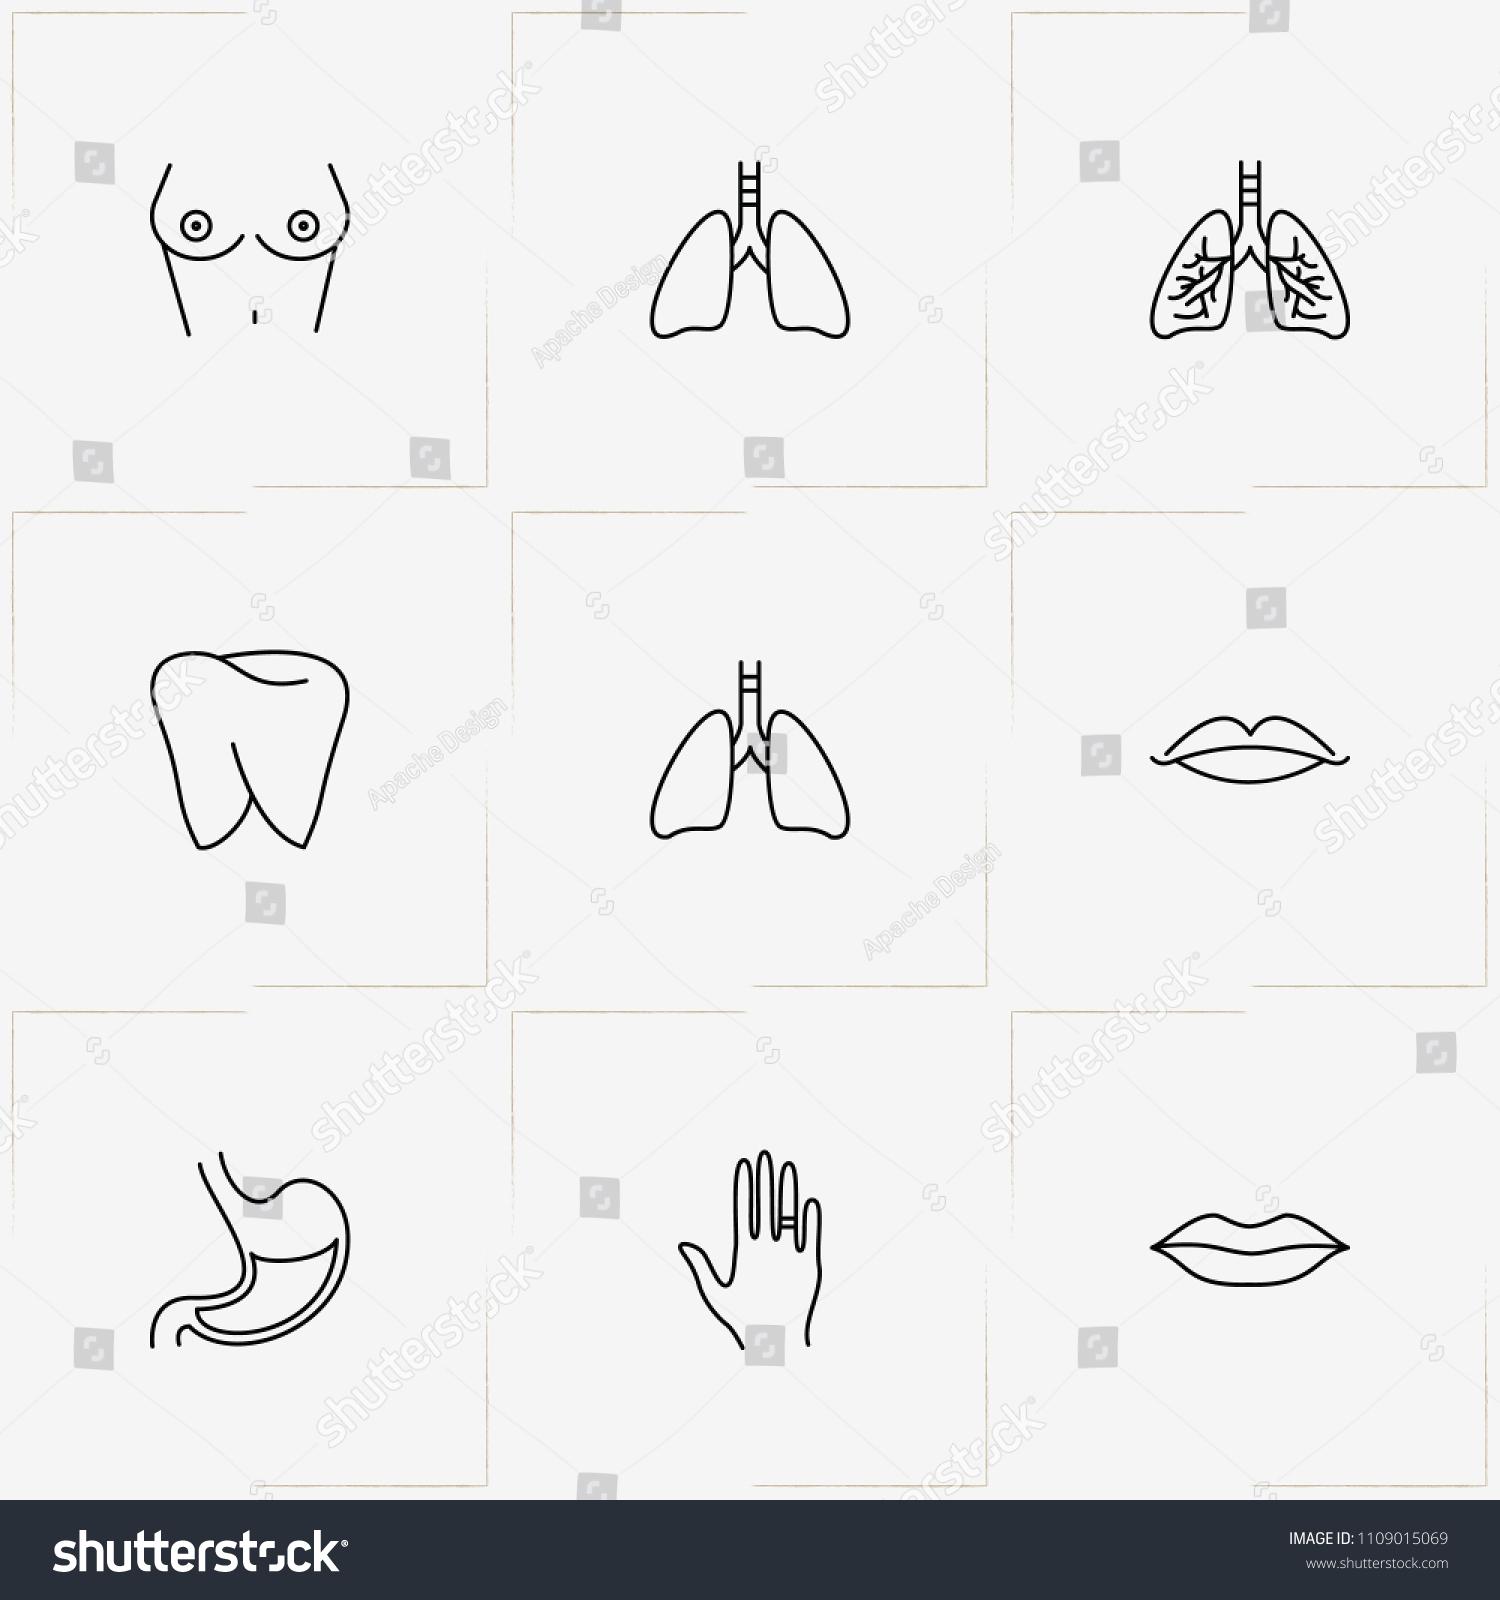 Amazing Anatomy Of The Lips Ensign - Anatomy Ideas - yunoki.info